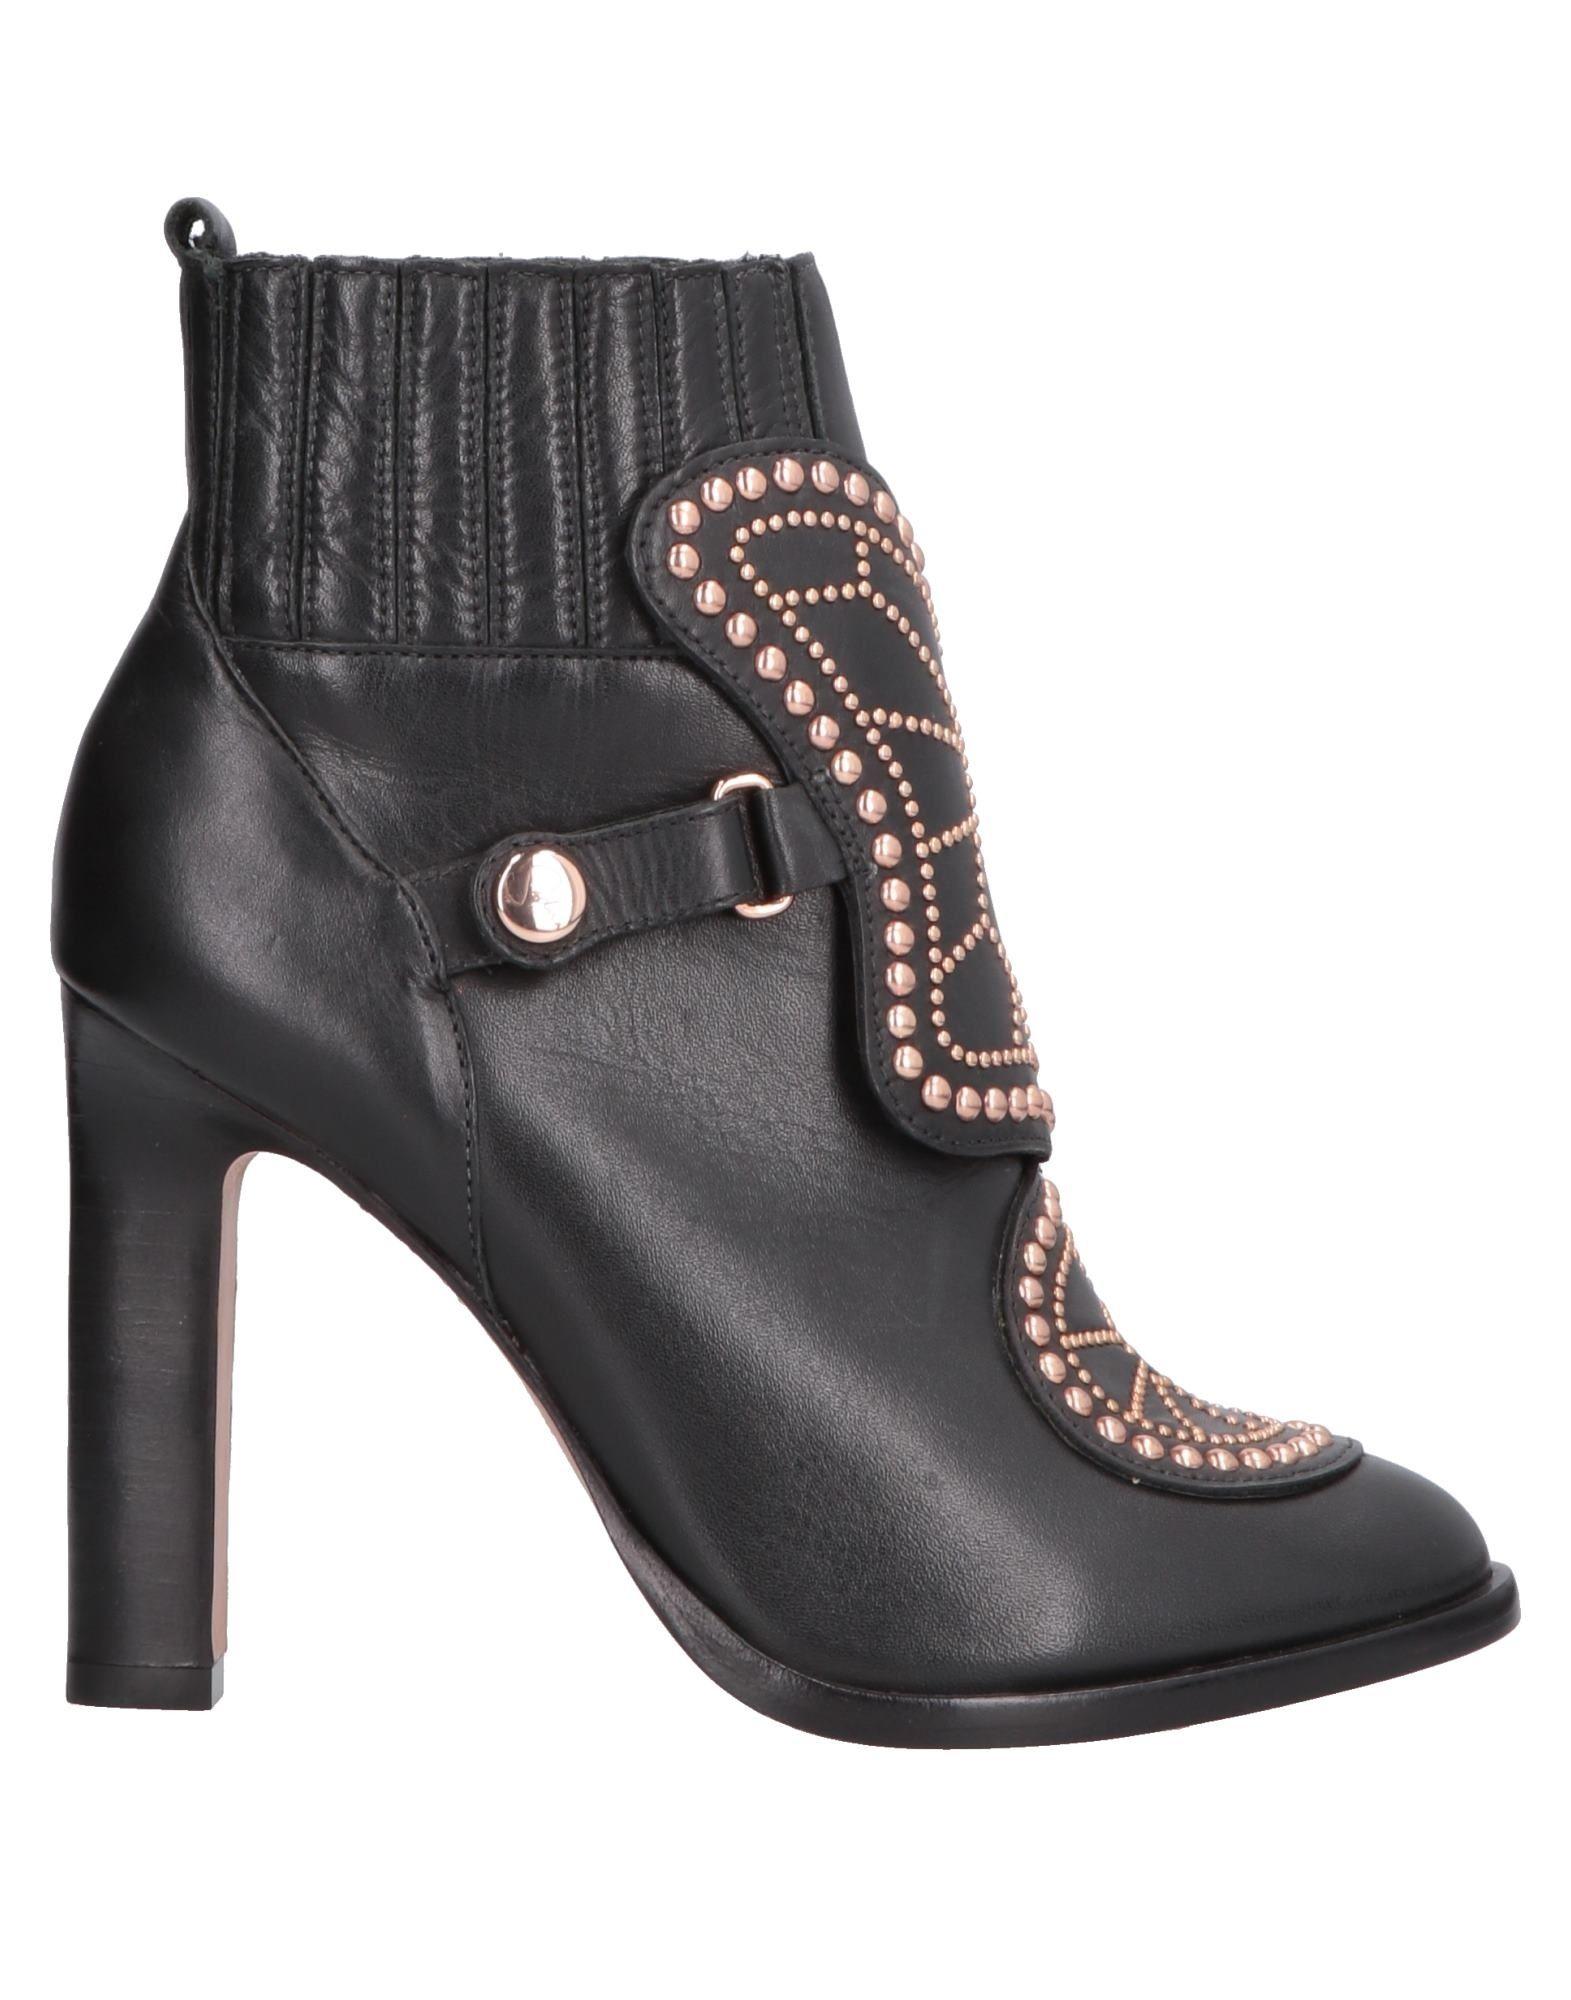 SOPHIA WEBSTER Полусапоги и высокие ботинки sophia webster полусапоги и высокие ботинки